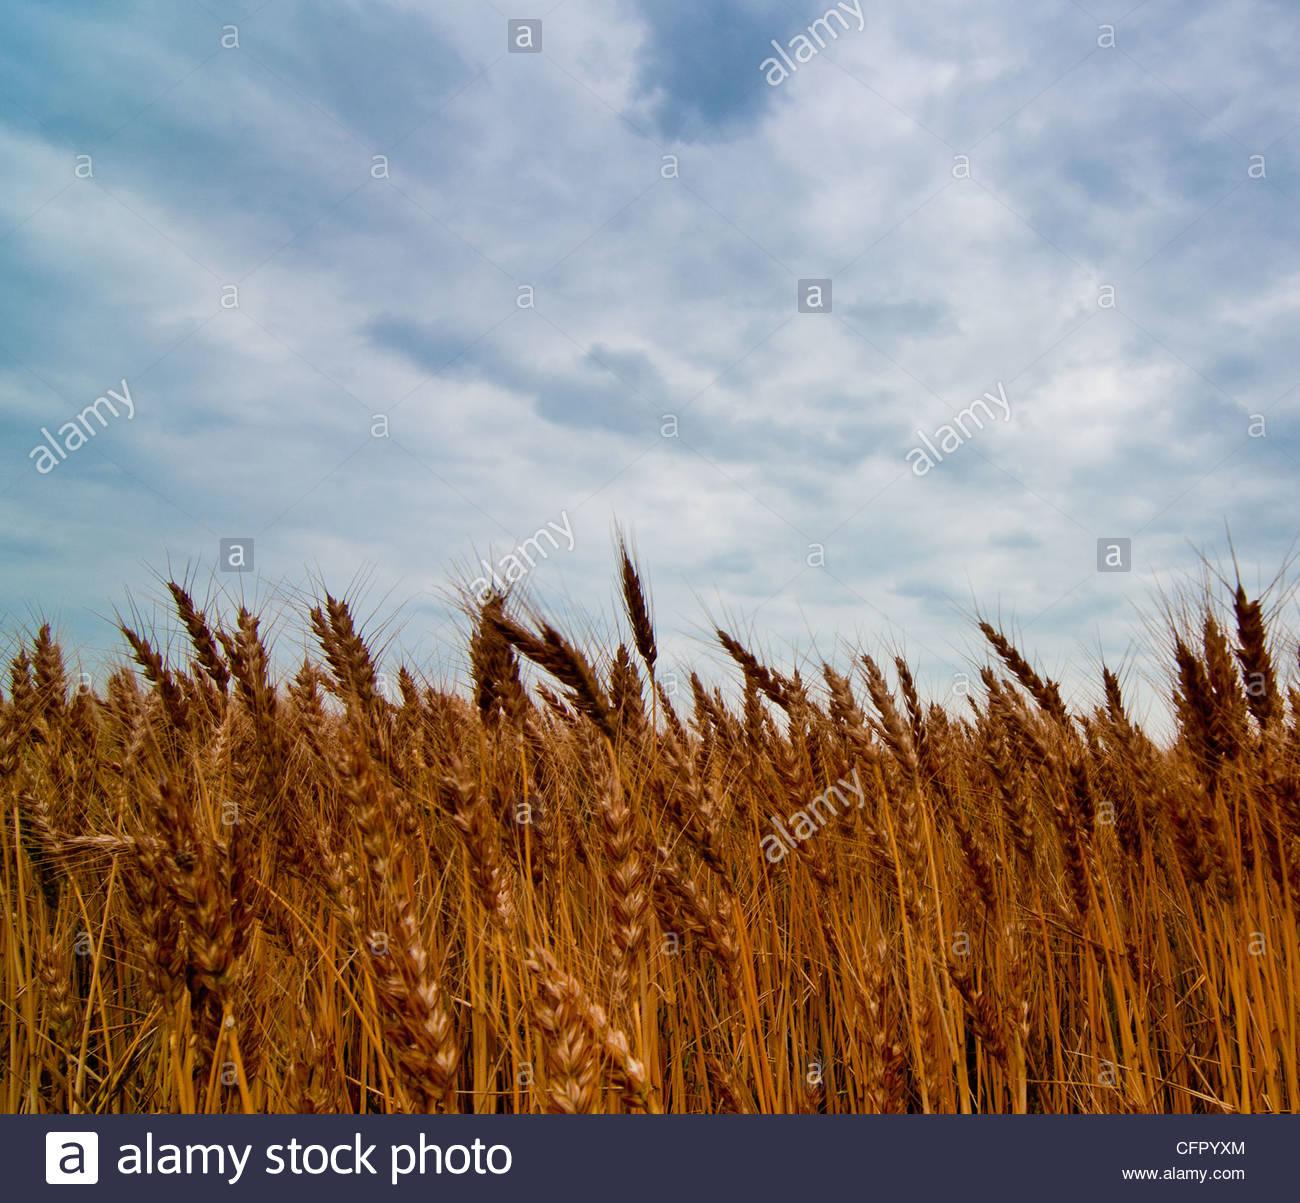 Kansas Wheat, Sumner County, KS, May 30, 2011 - Stock Image